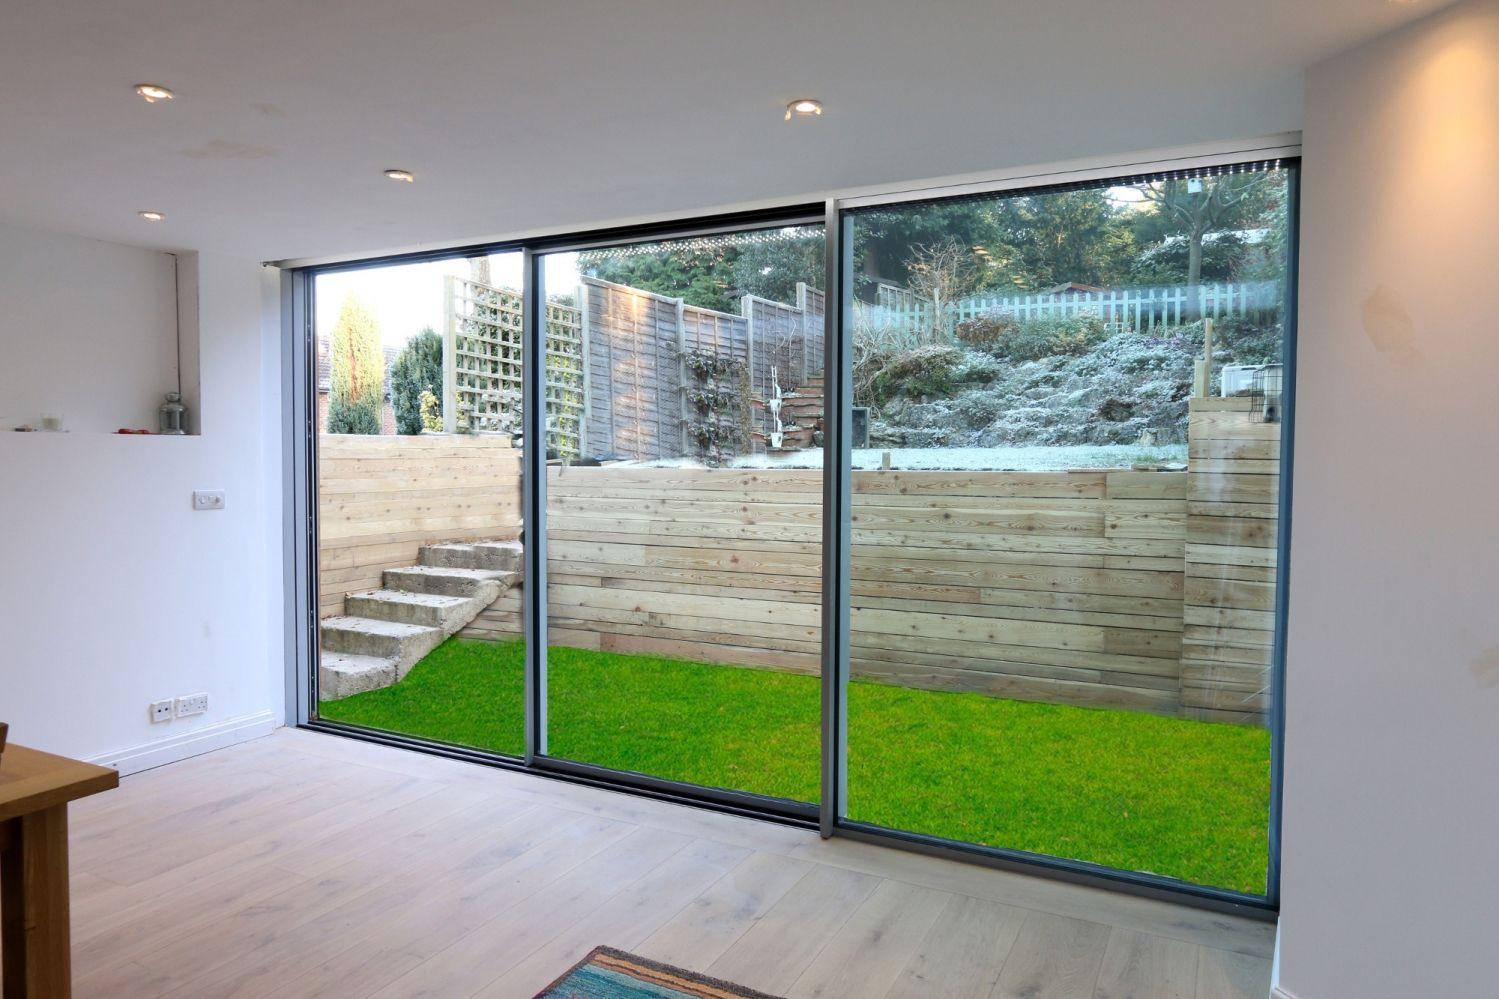 The Sieger 30 sliding glass doors from Hedgehog Aluminium